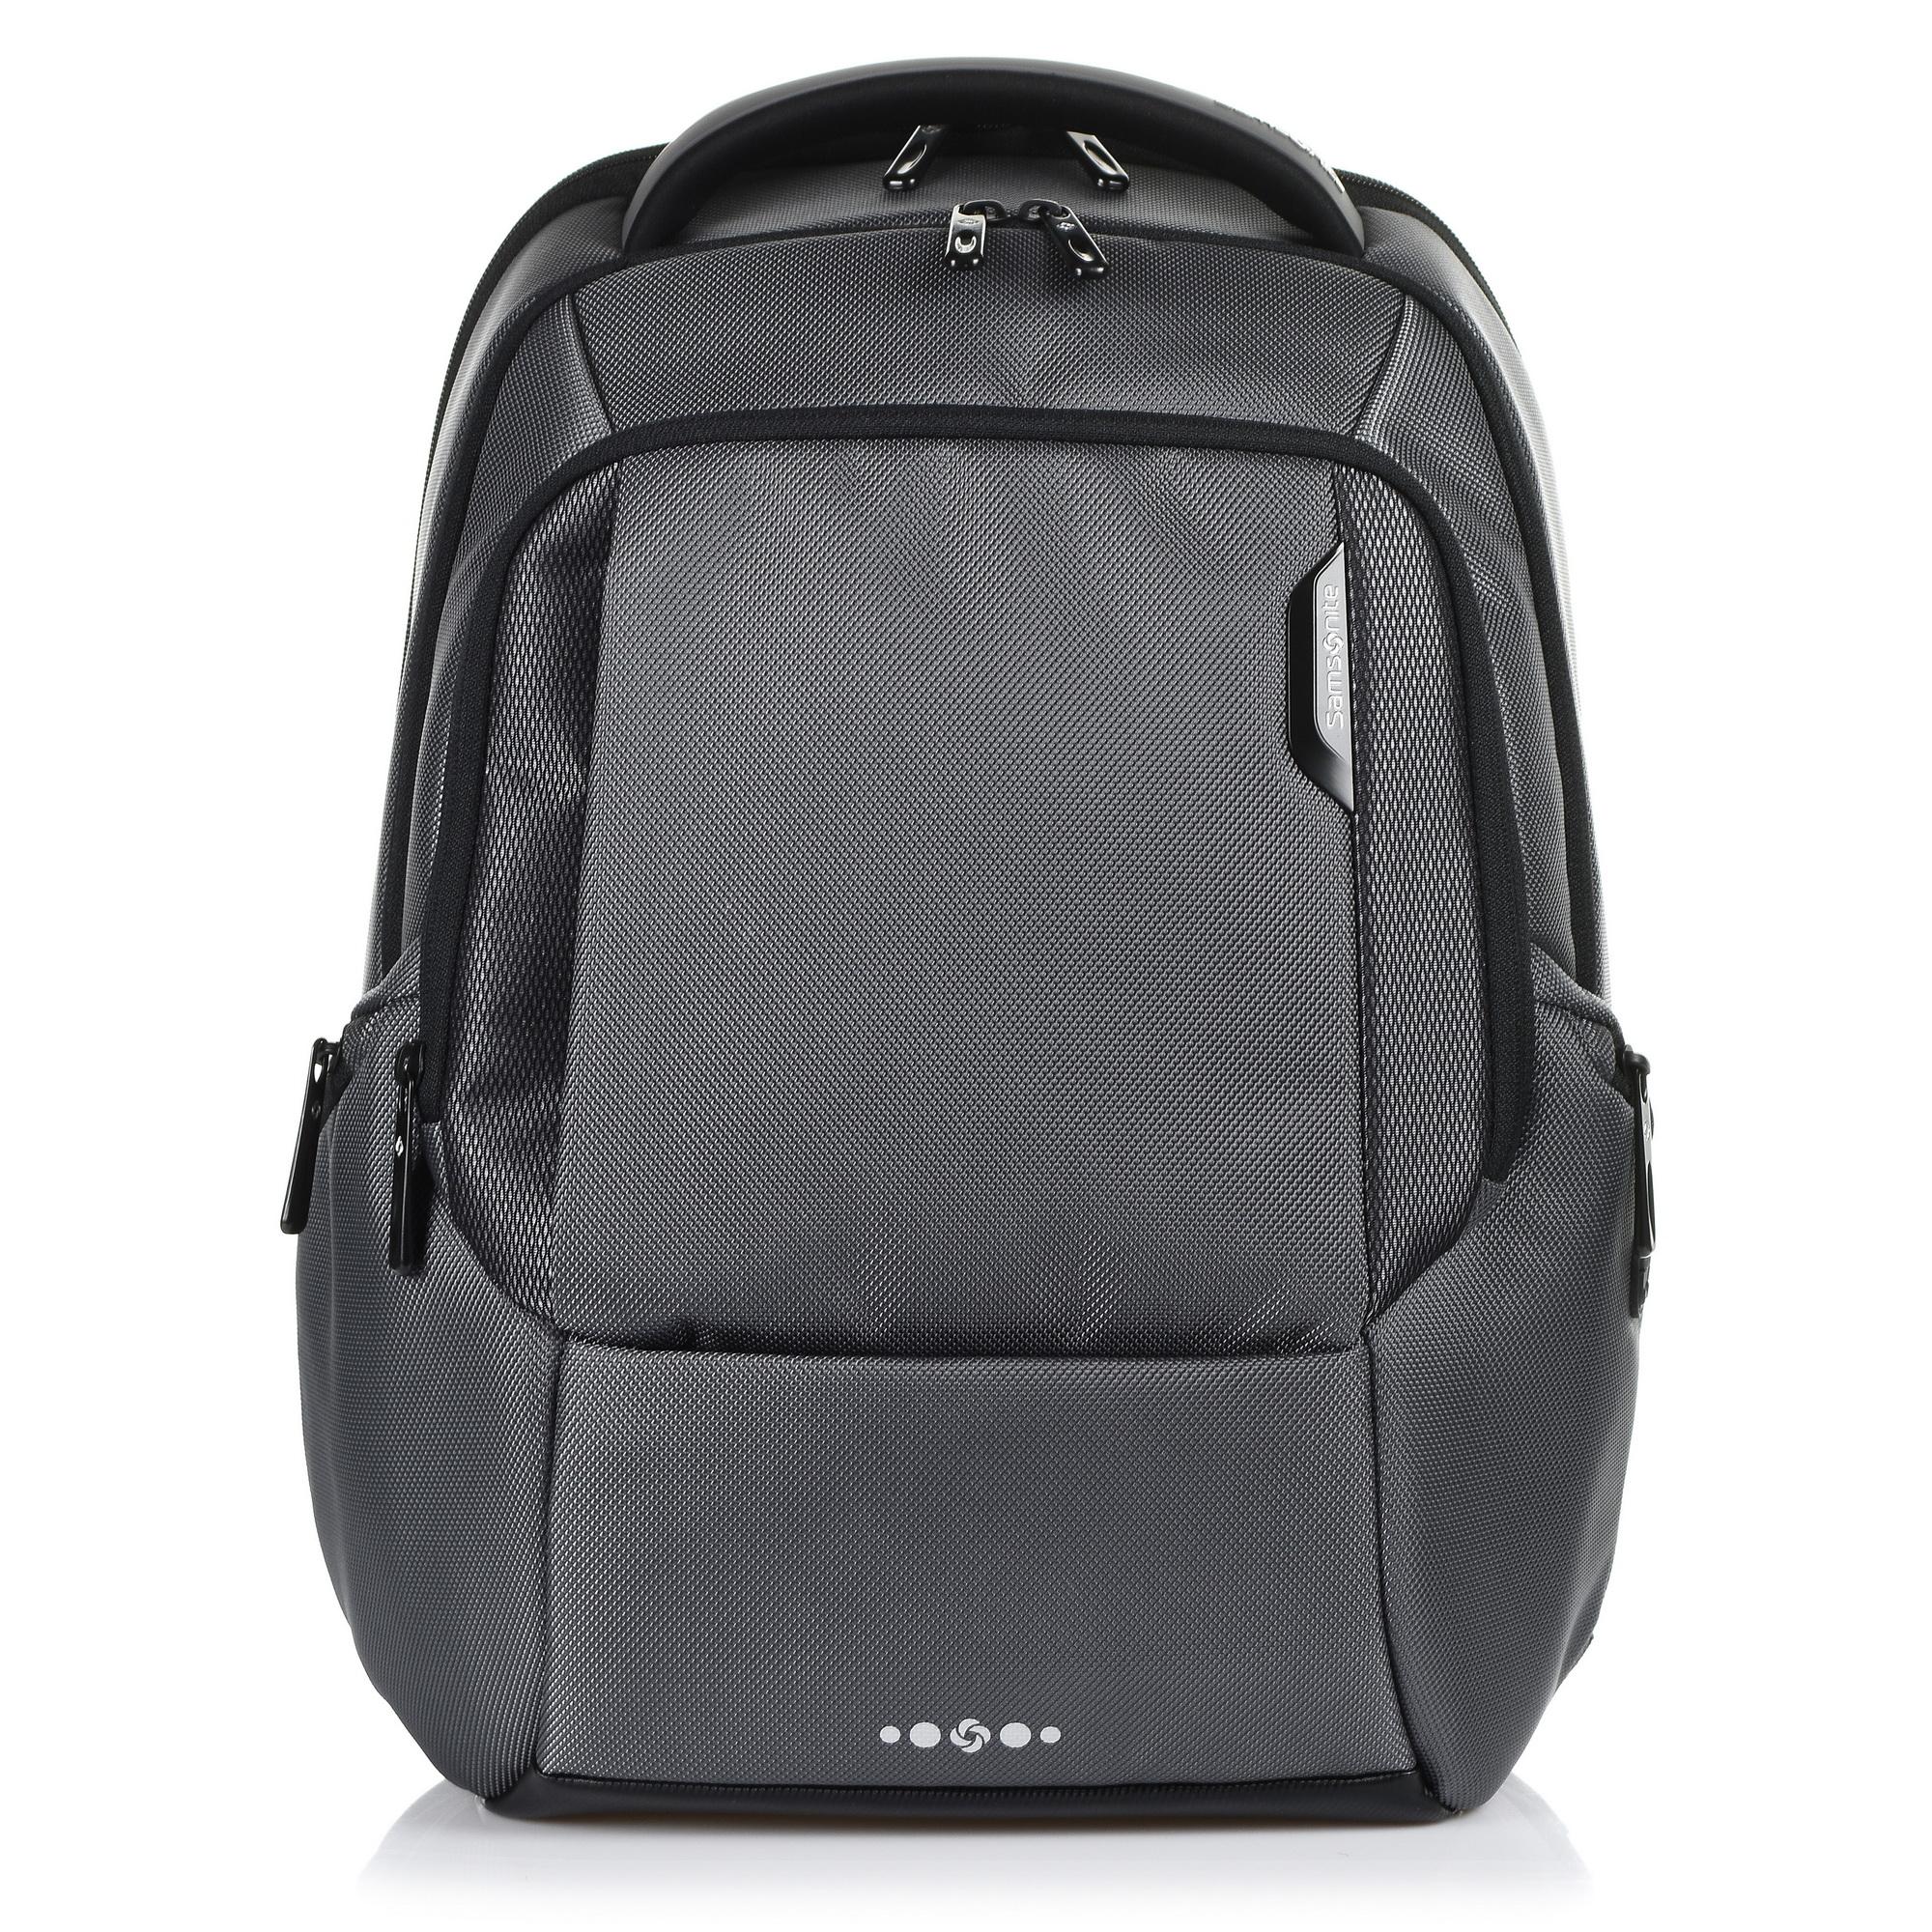 9621f94c18a Brandbags Σακίδιο Πλάτης Samsonite Cityscape Tech Laptop Backpack 14